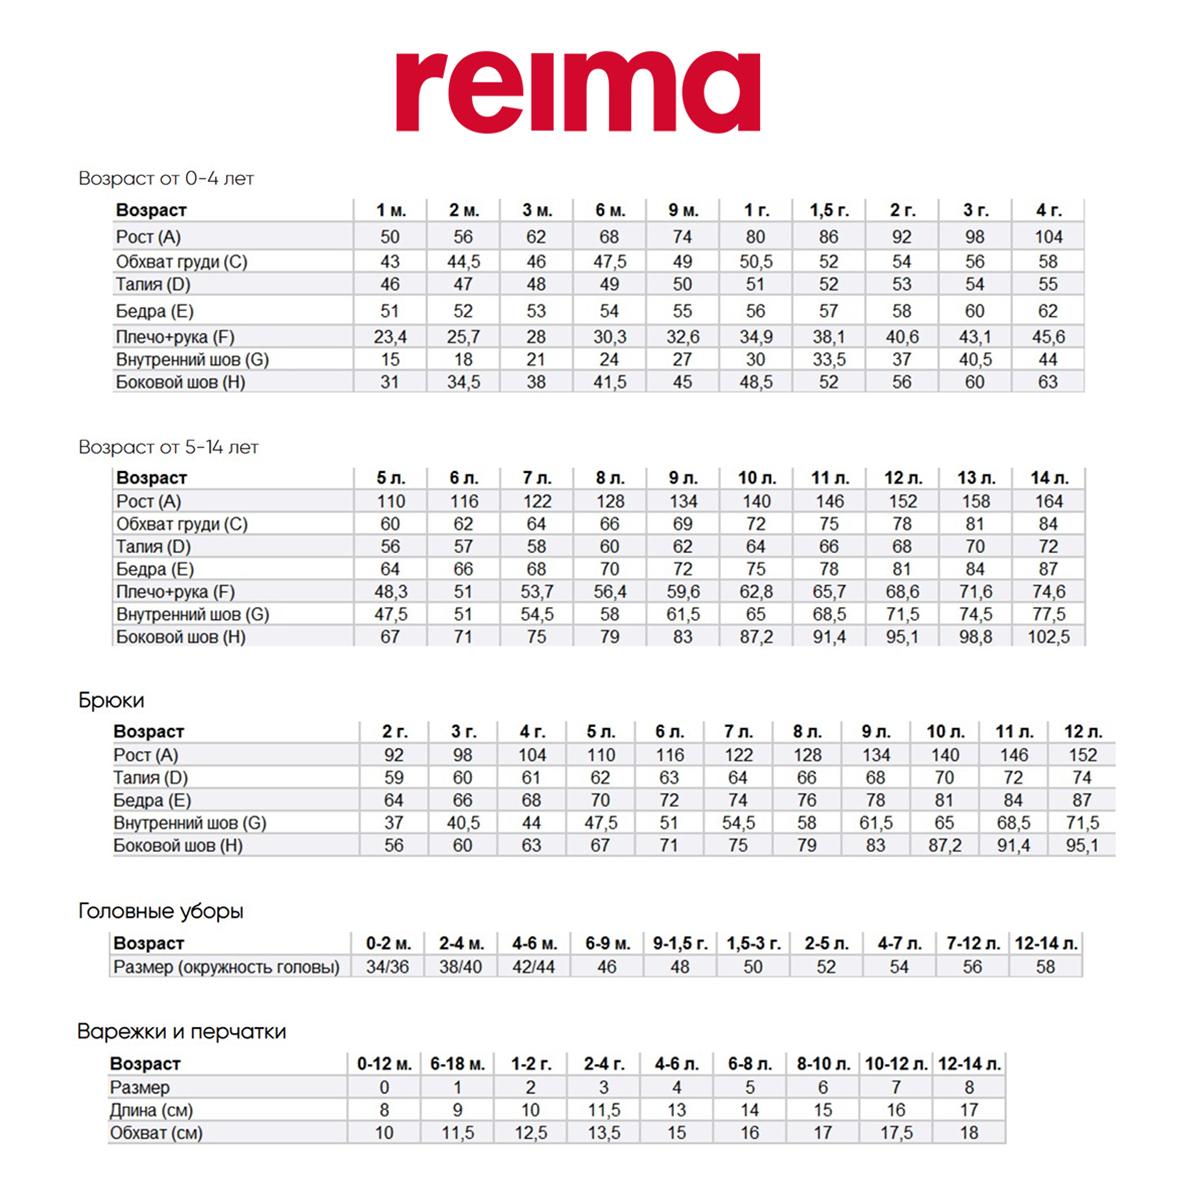 Купить Брюки, джинсы, шорты, Шорты Reima Cebu, р. 128 582457-6851 ТМ: REIMA, синий